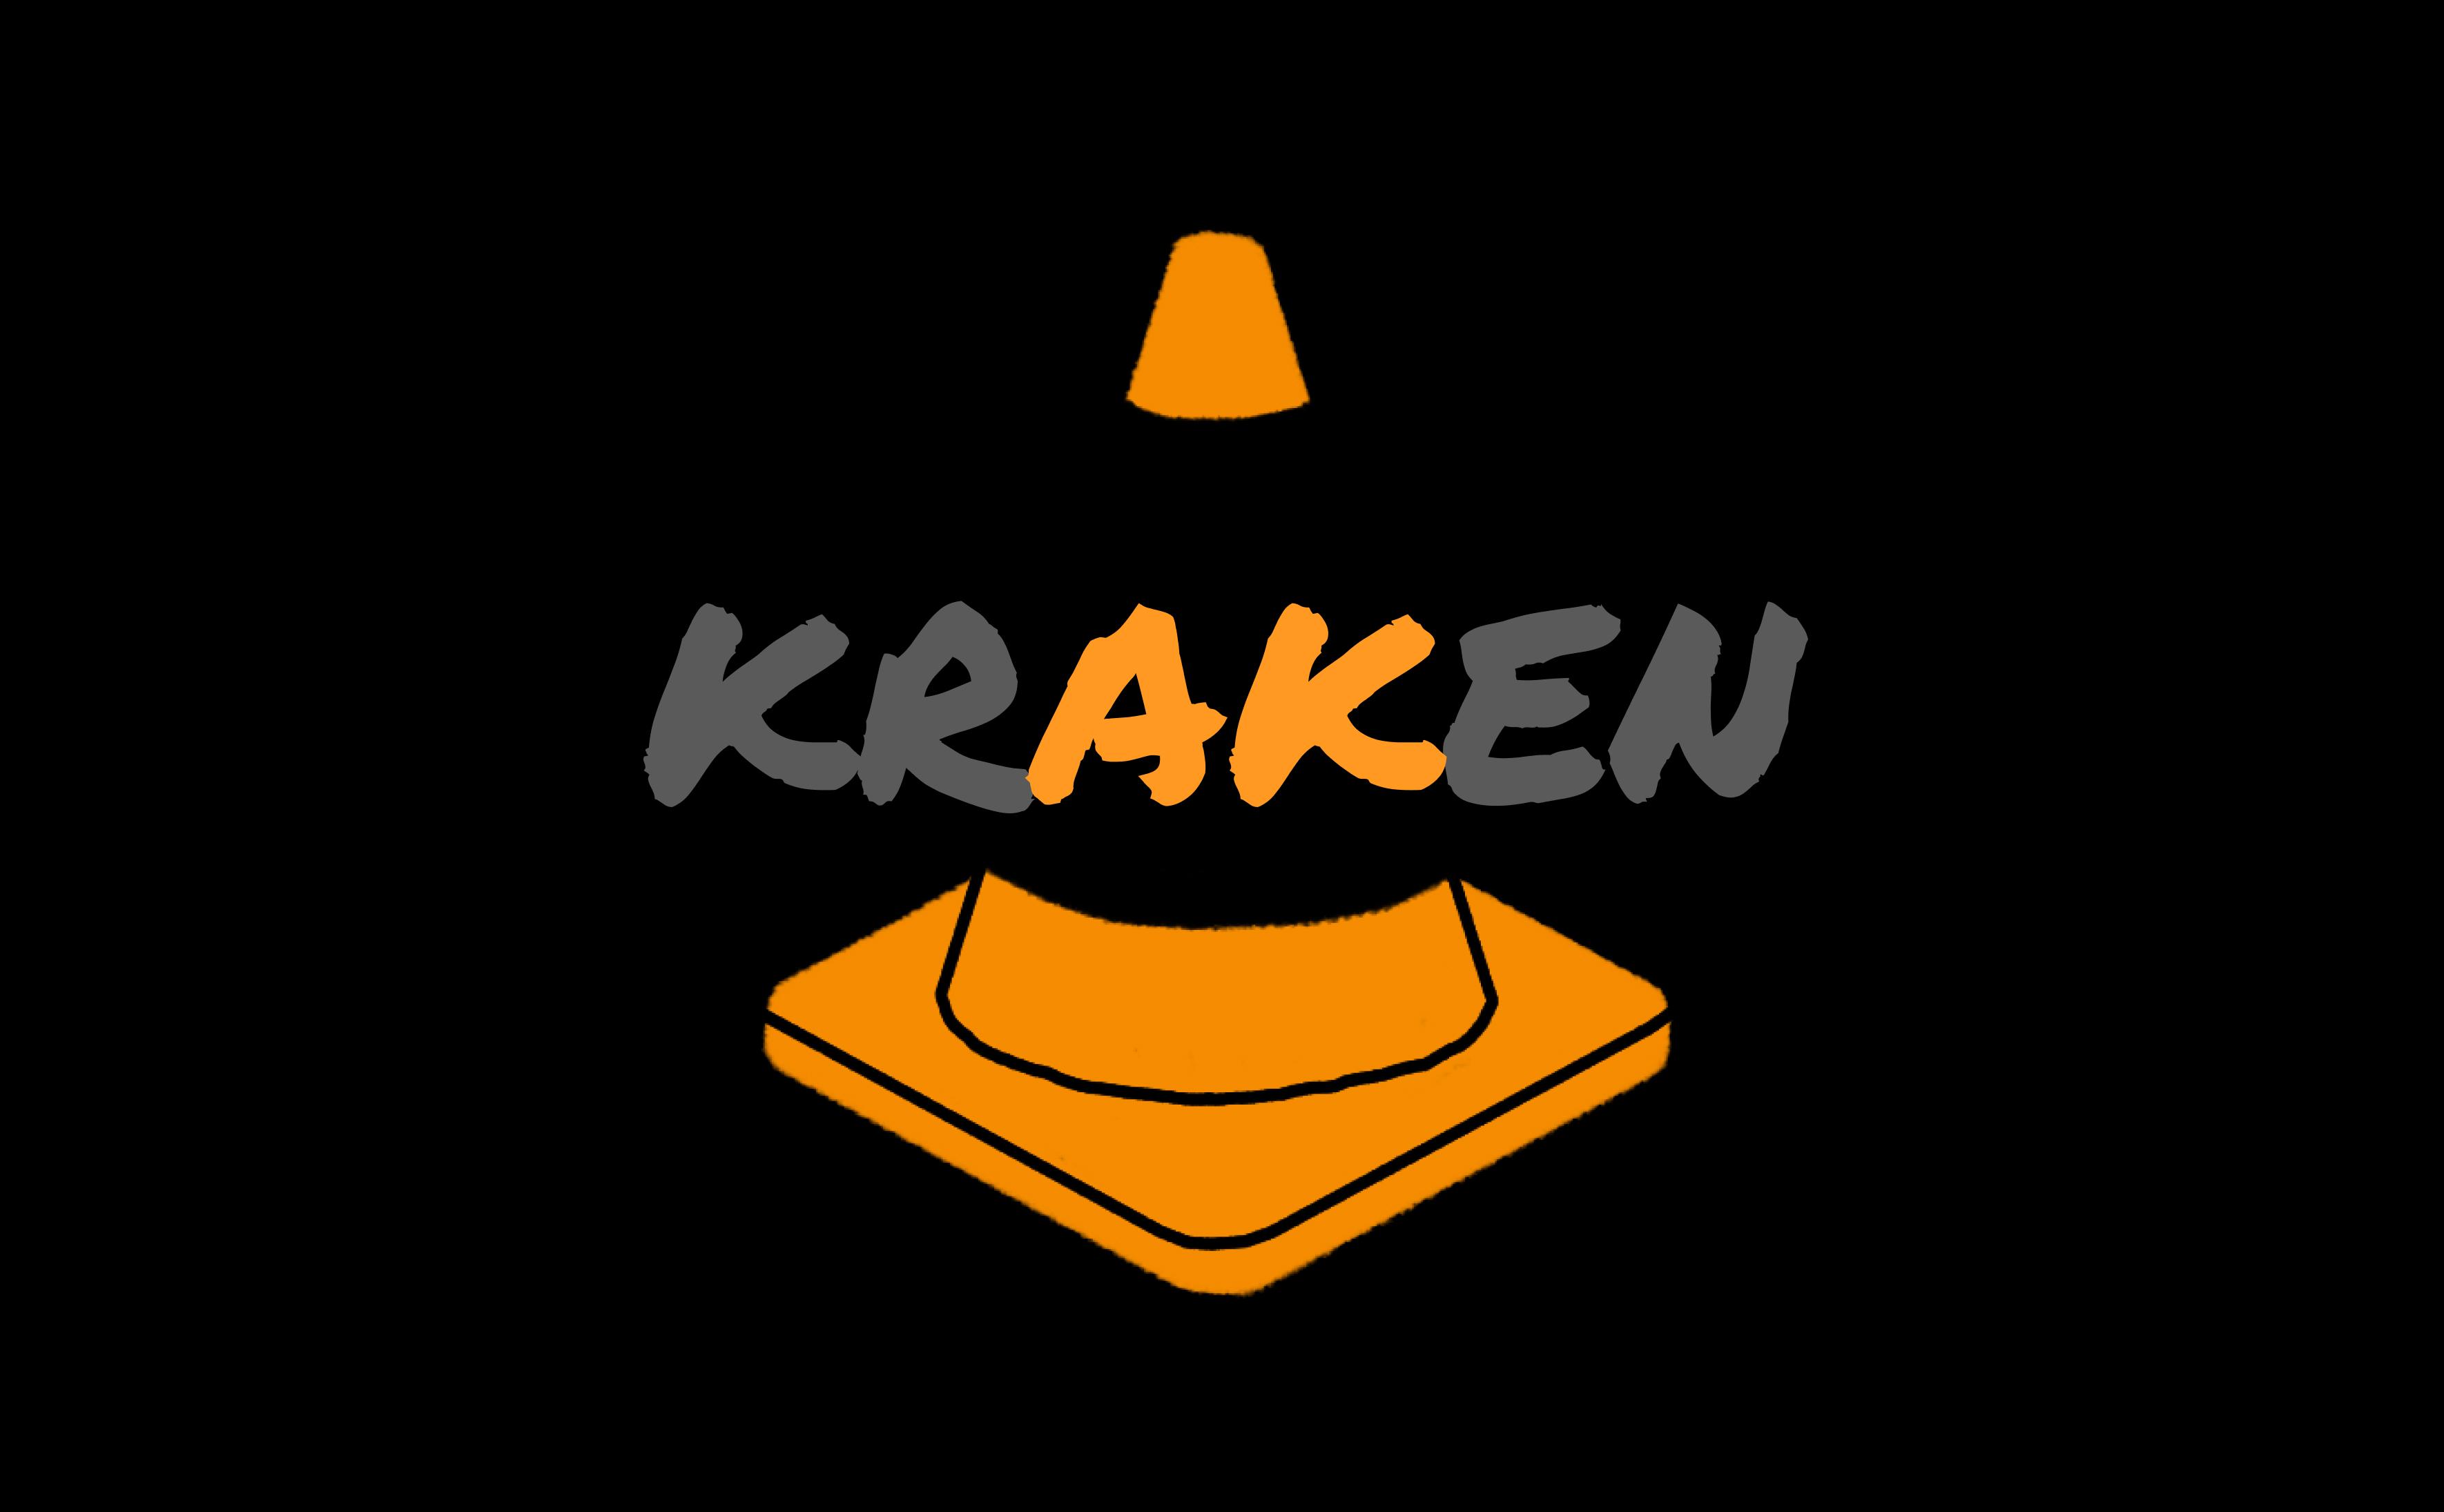 Власти США оштрафовали криптобиржу Kraken на $1,25 млн :: РБК.Крипто